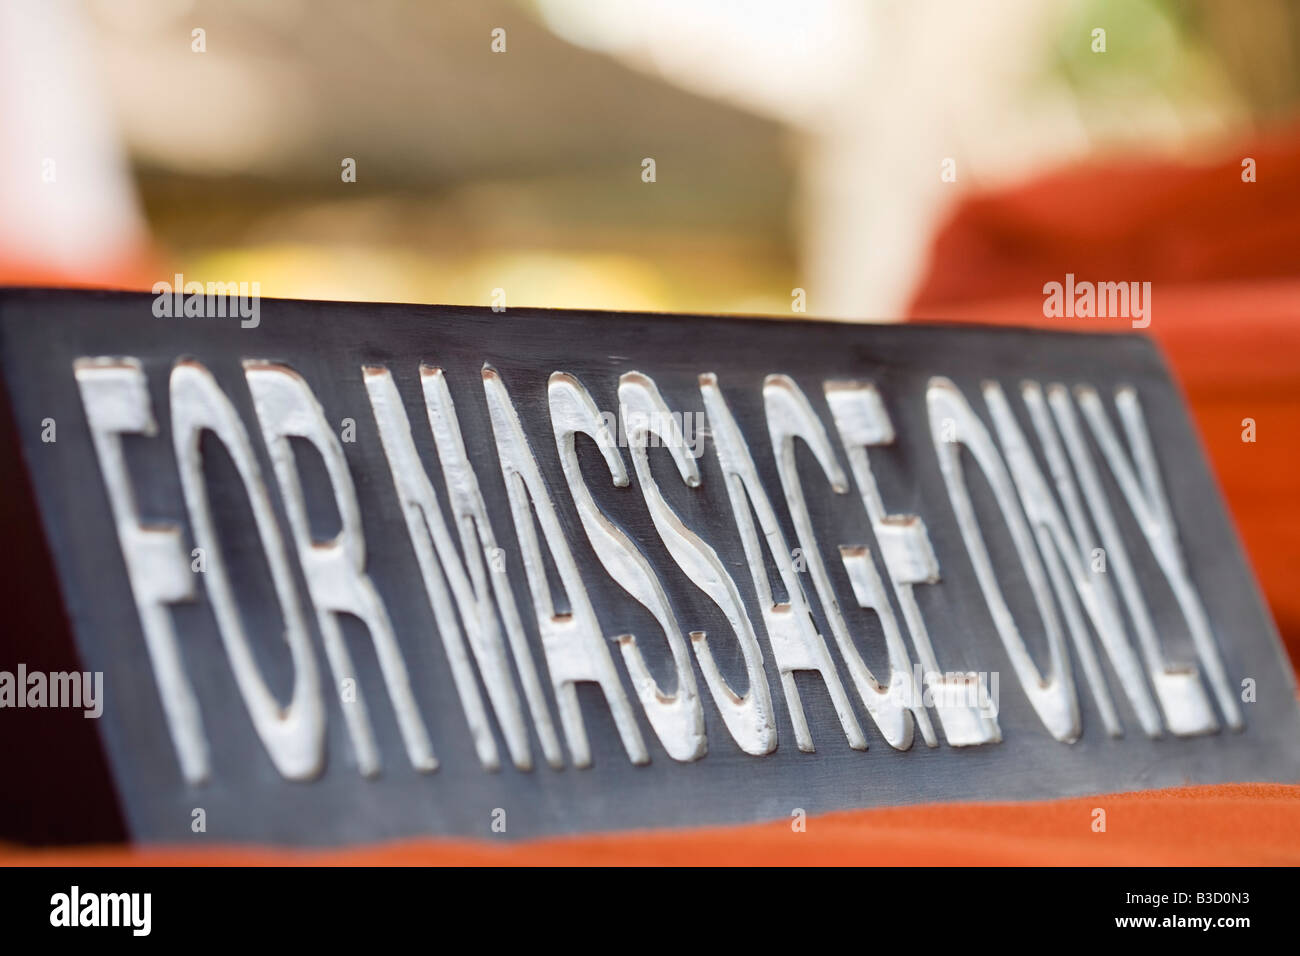 Massage sign, close-up - Stock Image